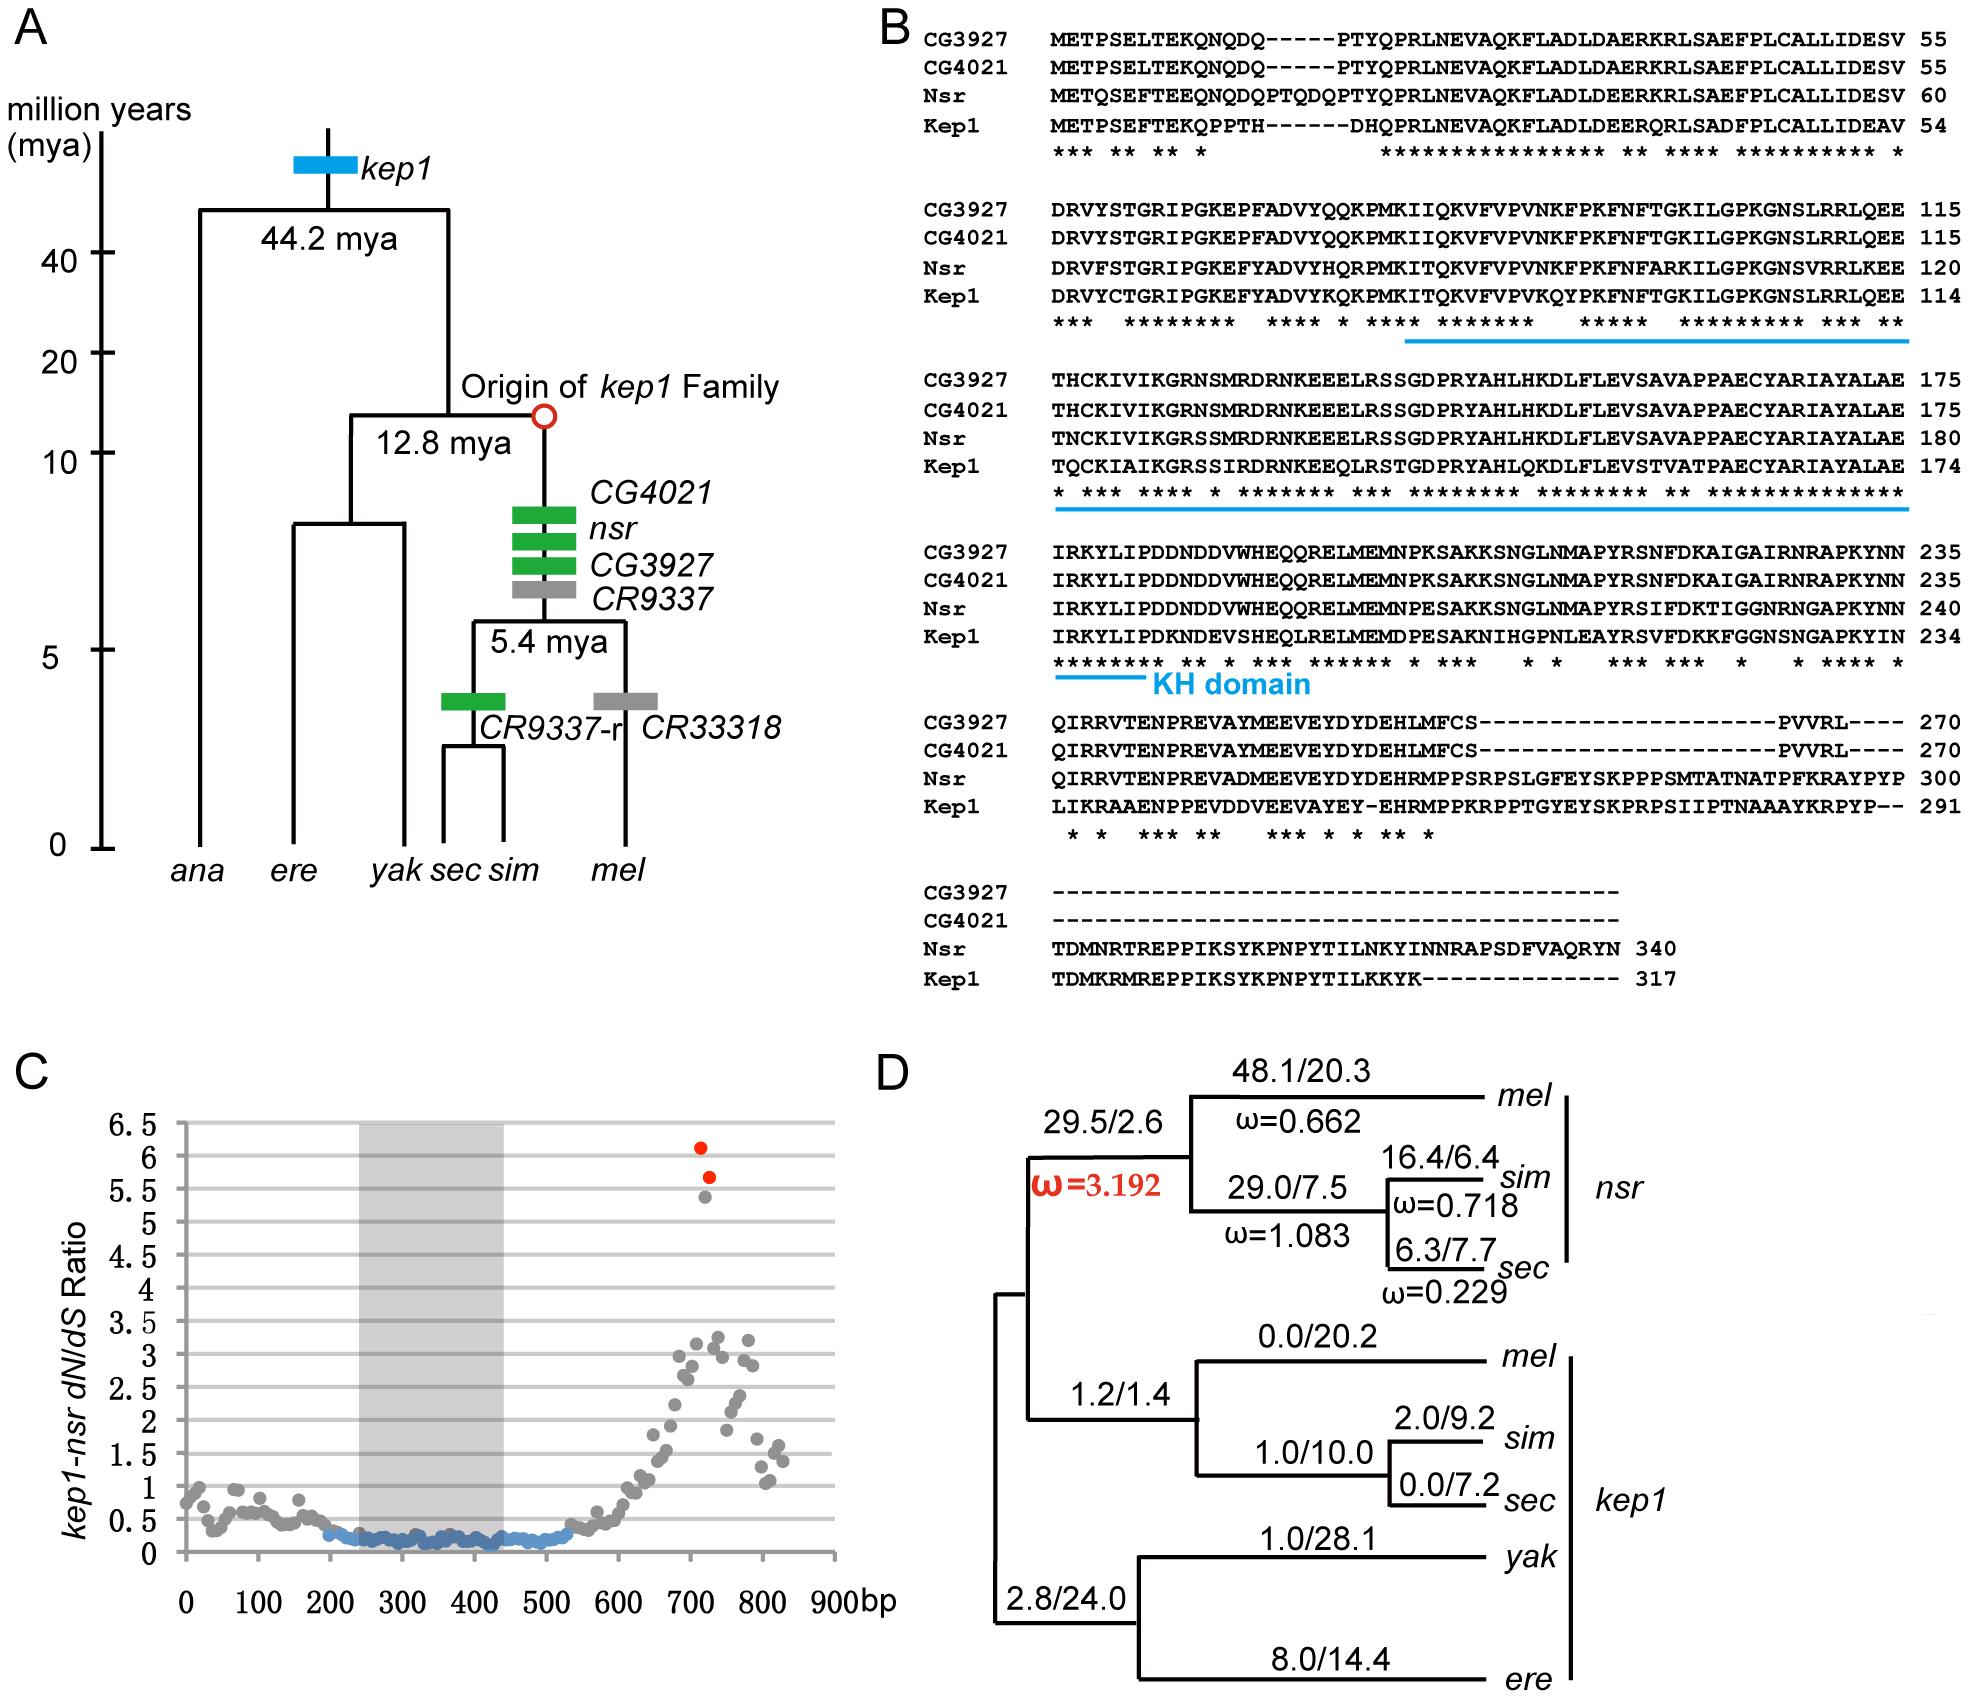 Evolutionary analysis of <i>kep1</i> family.